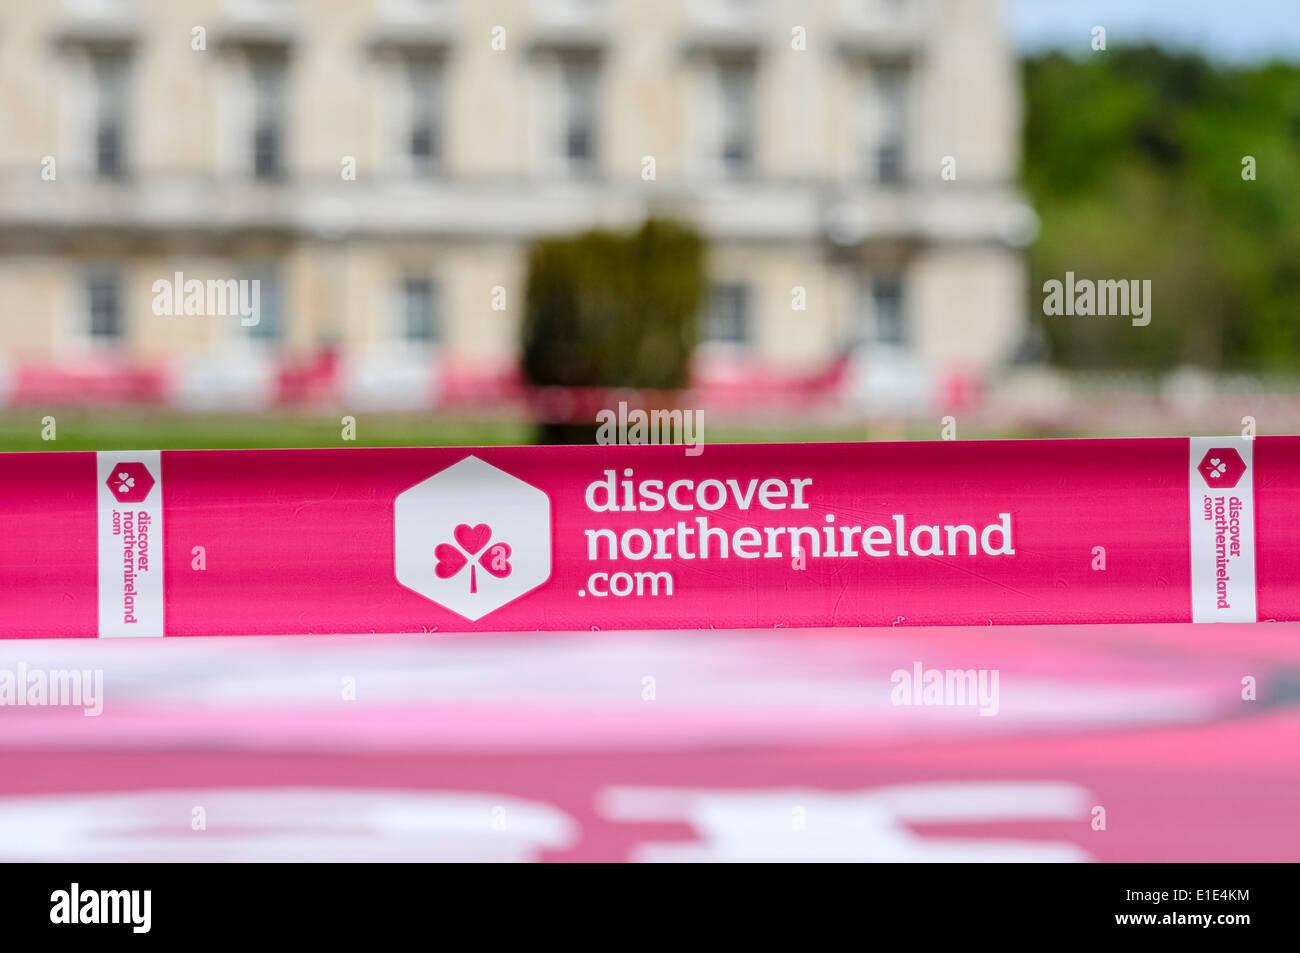 Découvrez l'Irlande du Nord bande discovernorthernireland.com Photo Stock